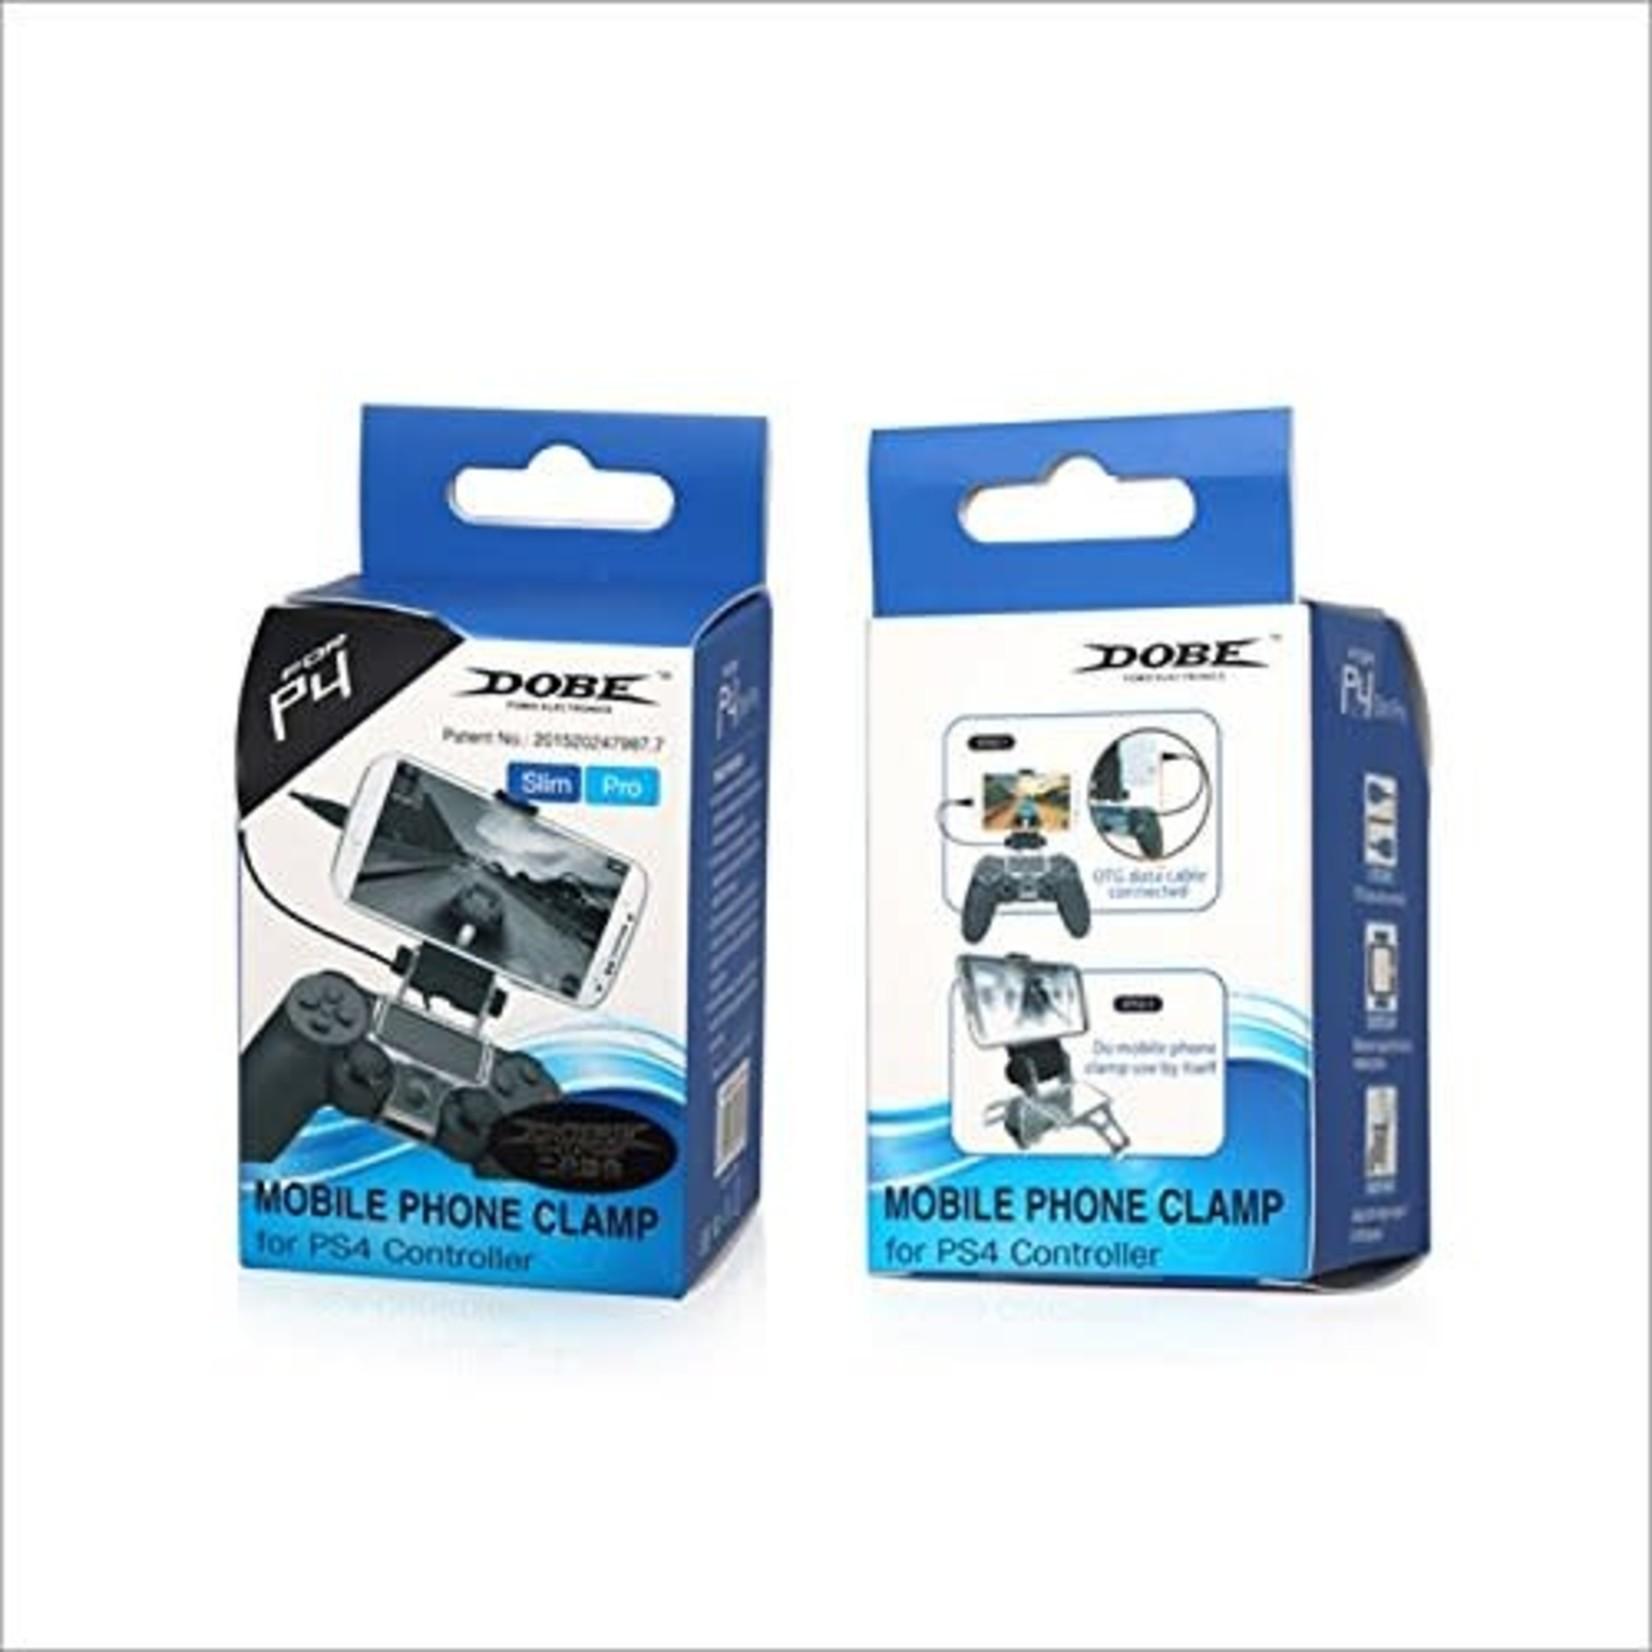 PS4-Dobe phone Clamp